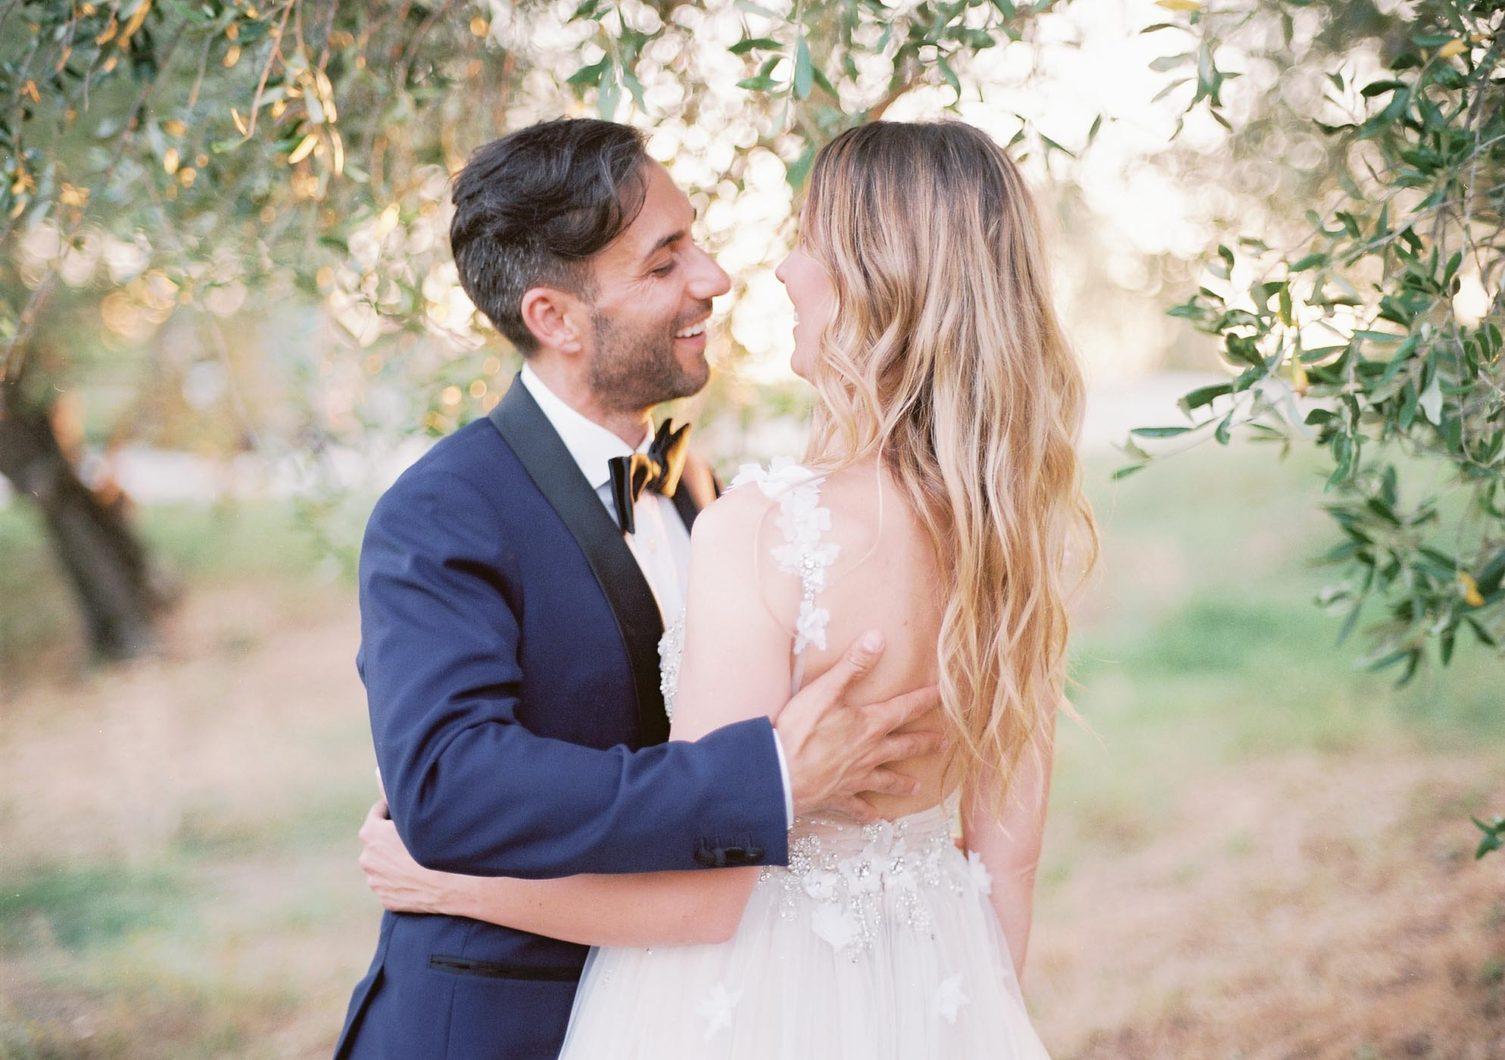 wedding_photographer_tuscany_italy_conti_di_san_bonifacio_5